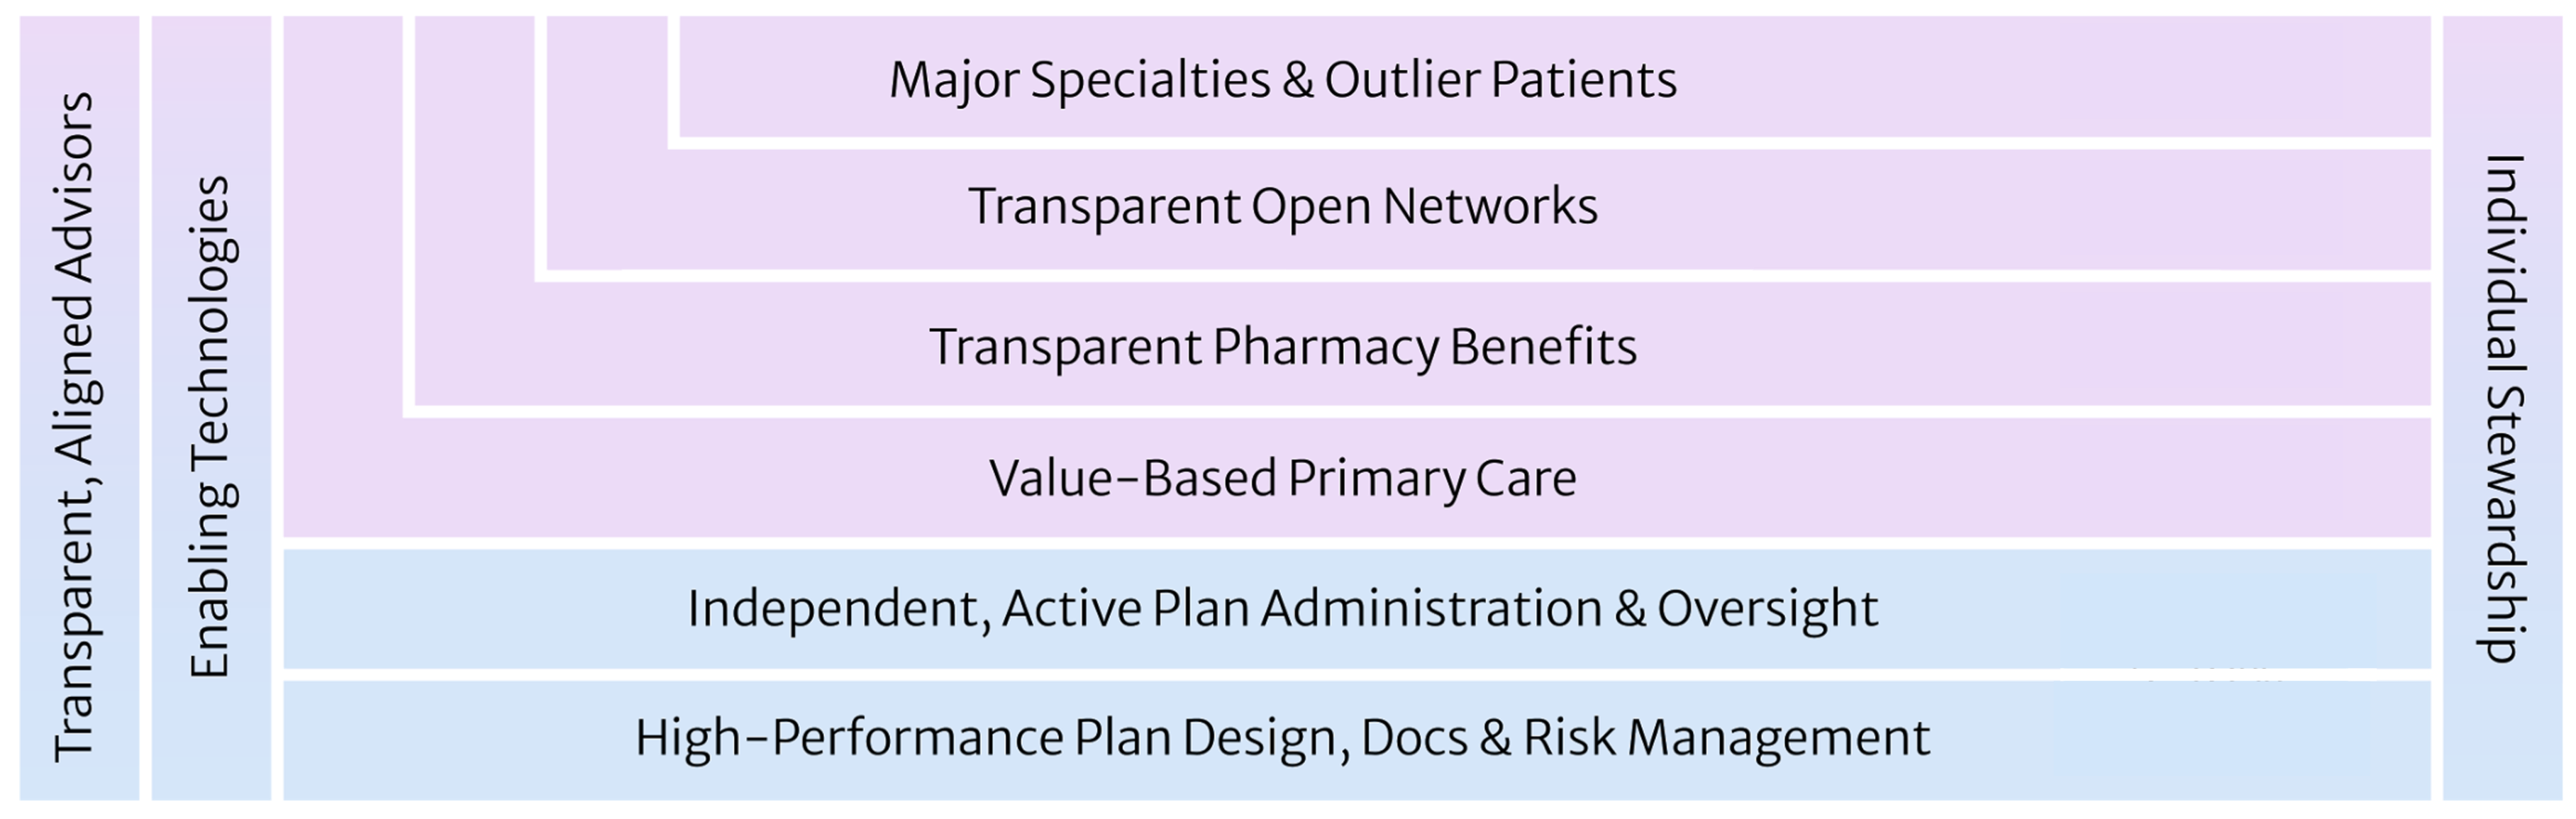 Health Rosetta Components